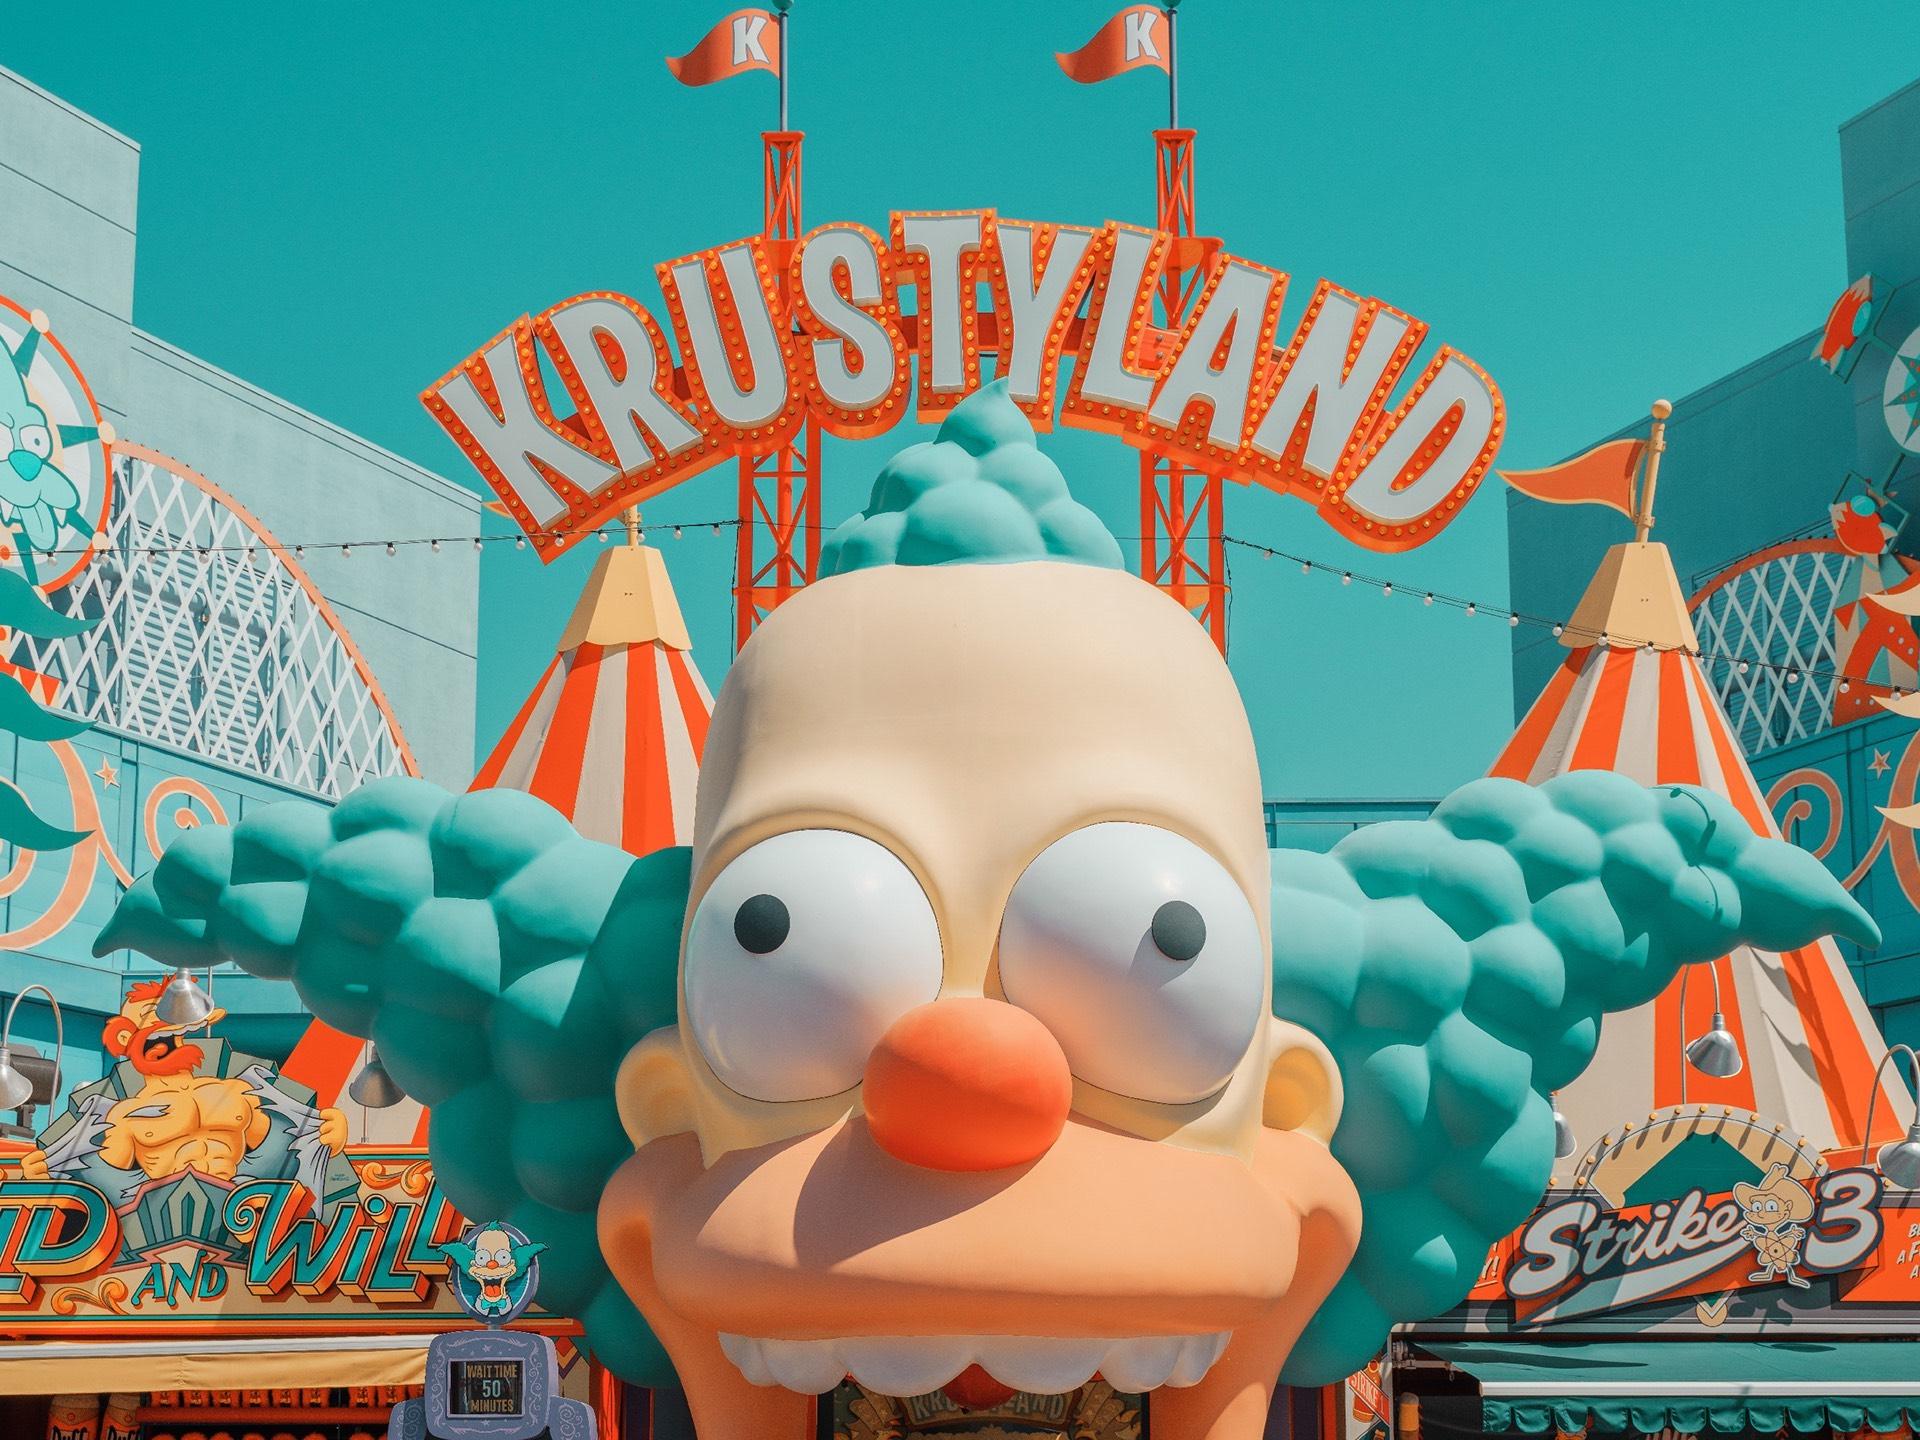 Krustyland Universal Studio Park - Neomag.